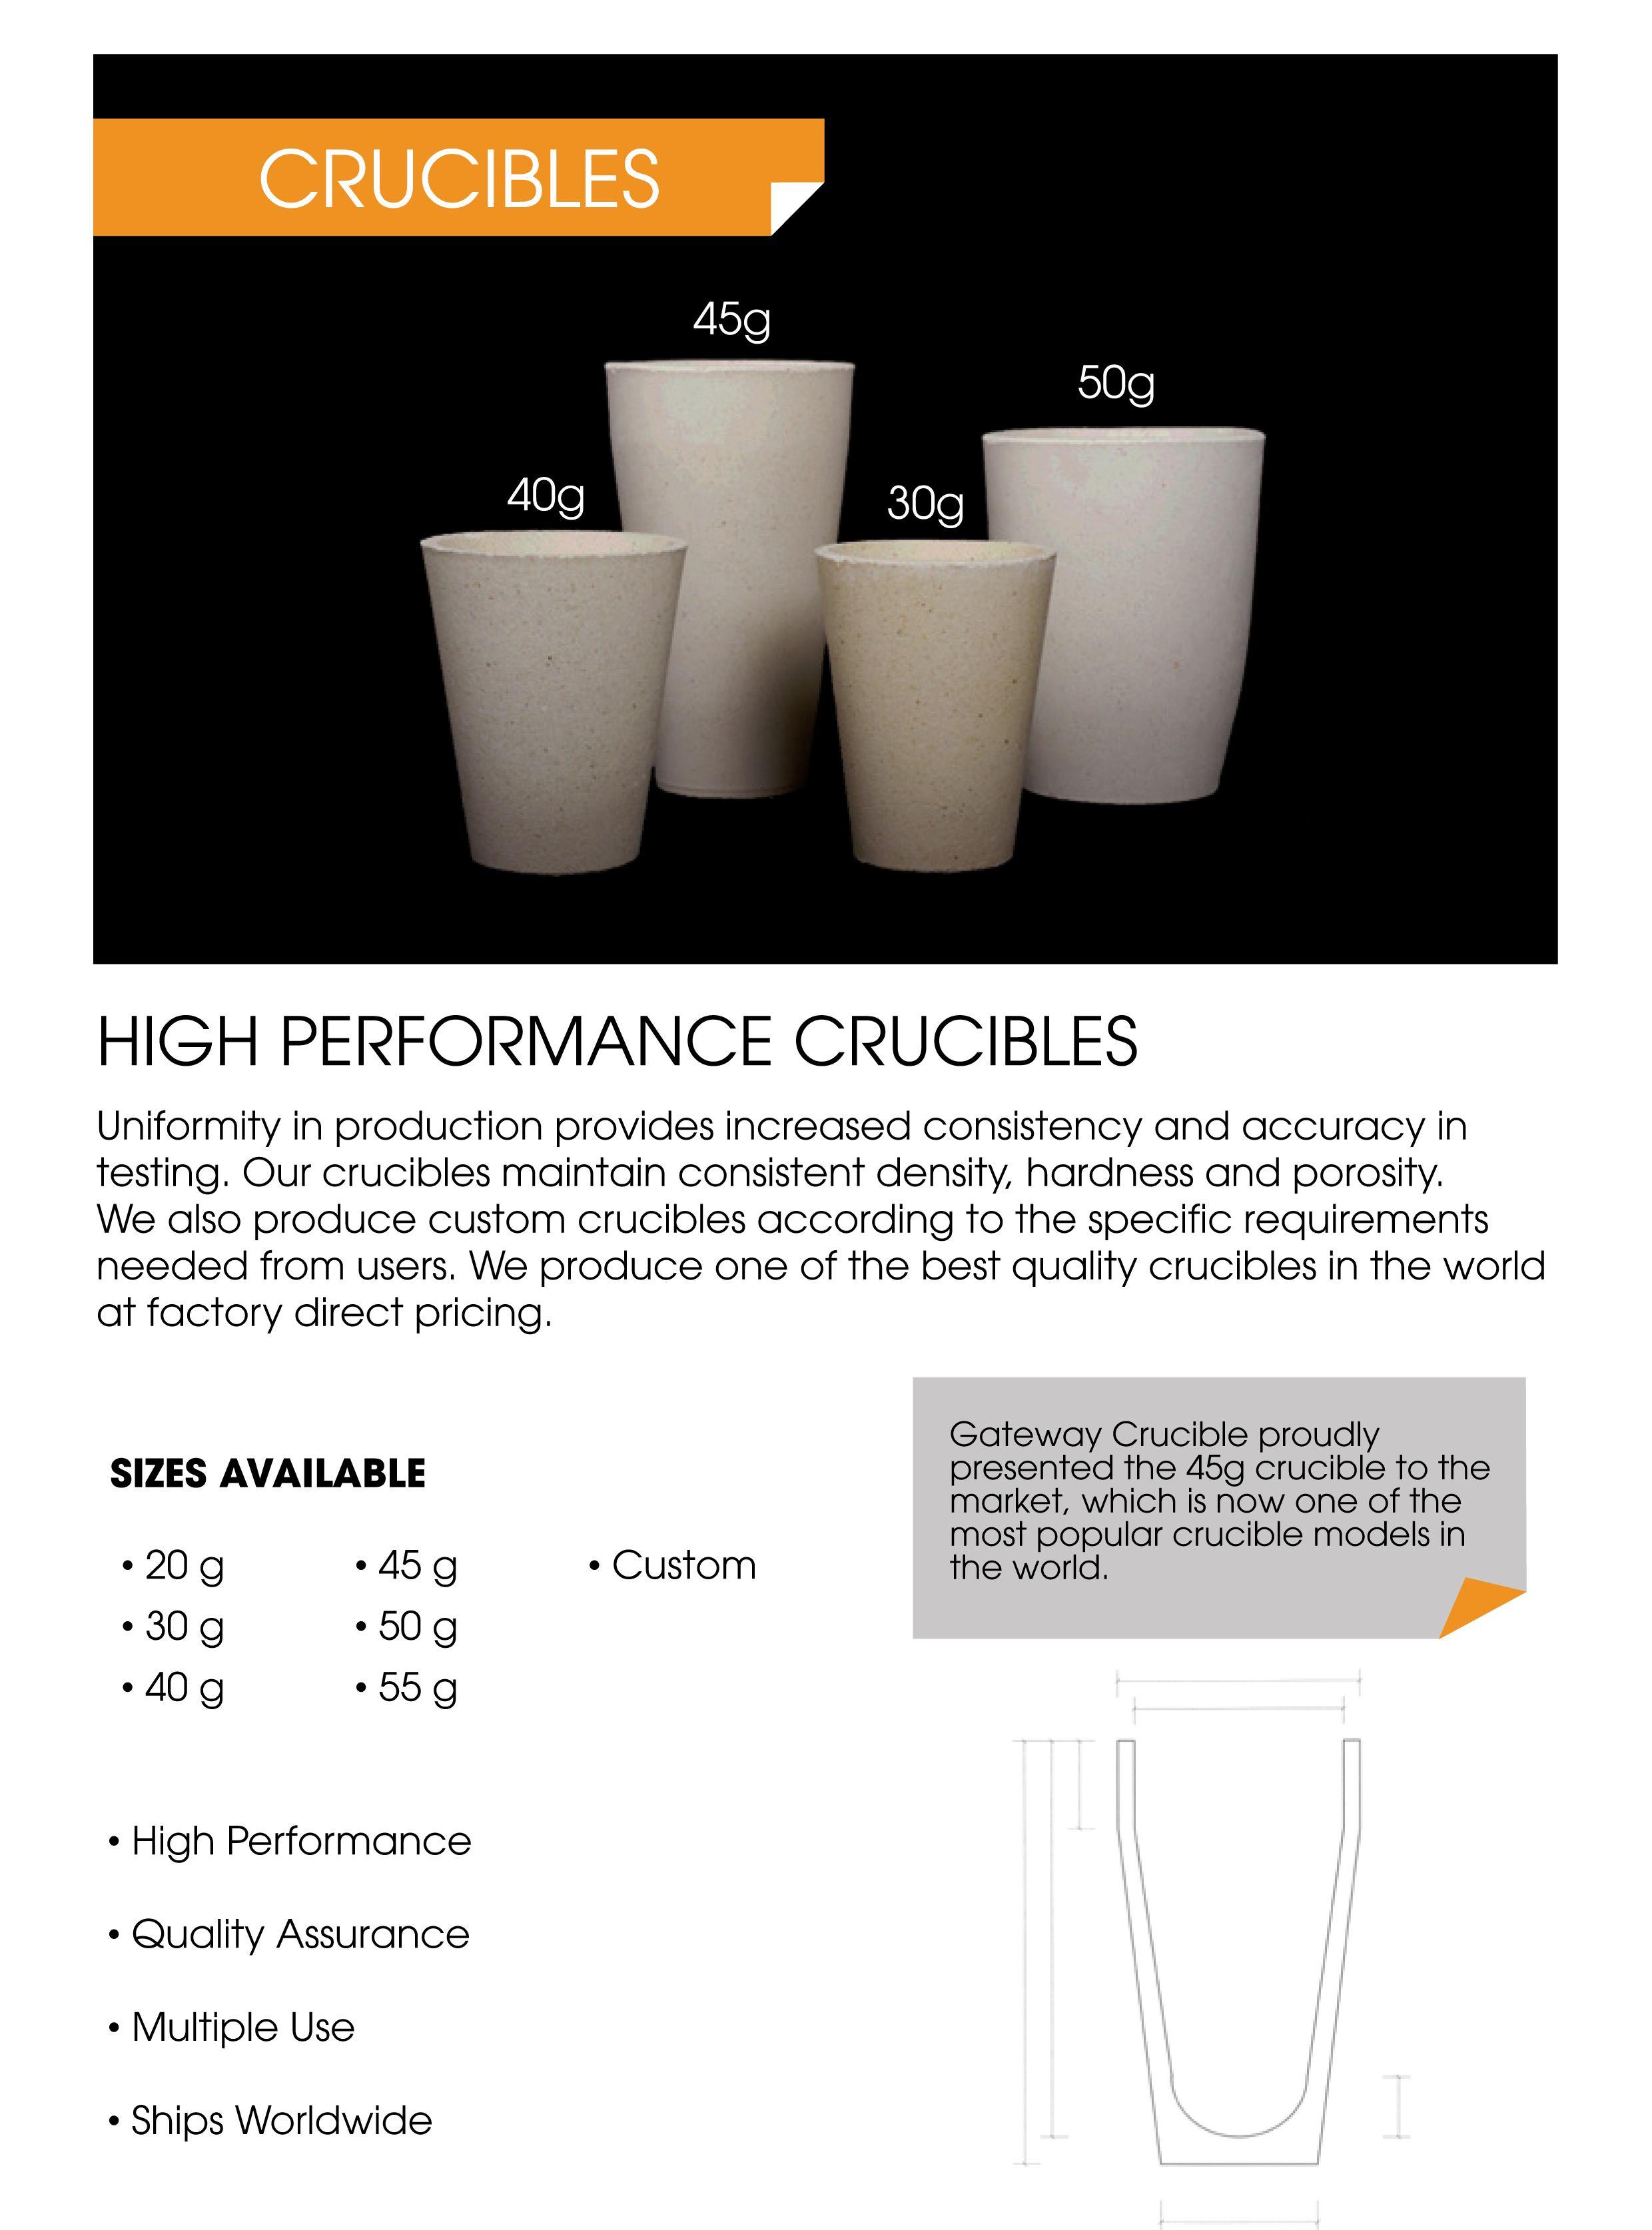 Fire Clay Crucible Fire Assay Crucible For Metal Lurgycrucible Fire Clay Ceramics Crucible